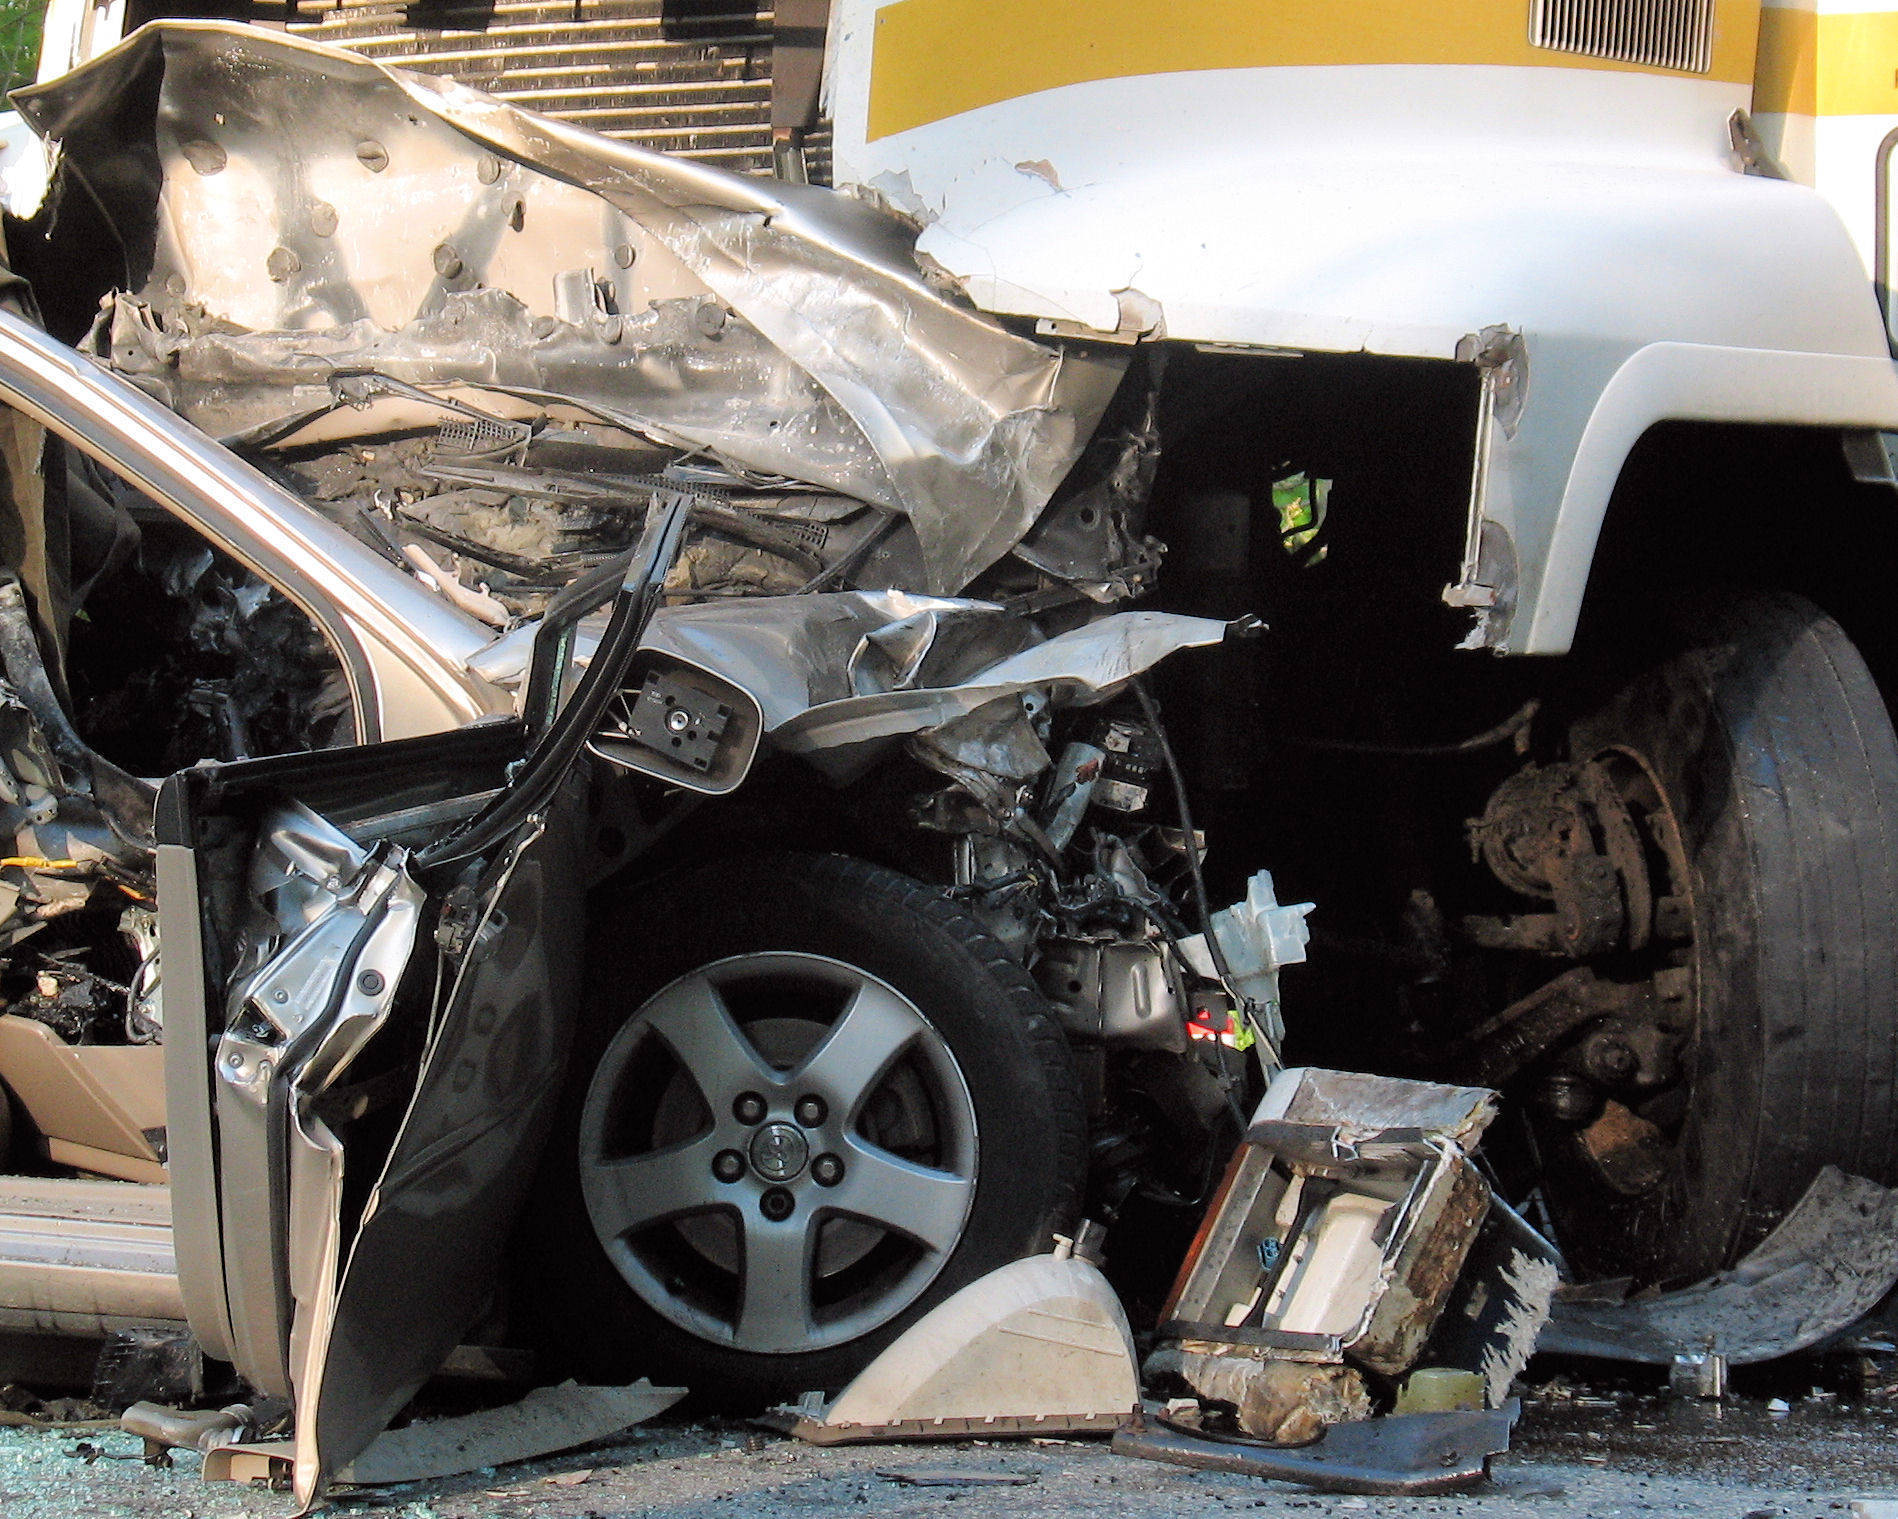 España consigue descender sus cifras de fallecidos en accidentes de tráfico